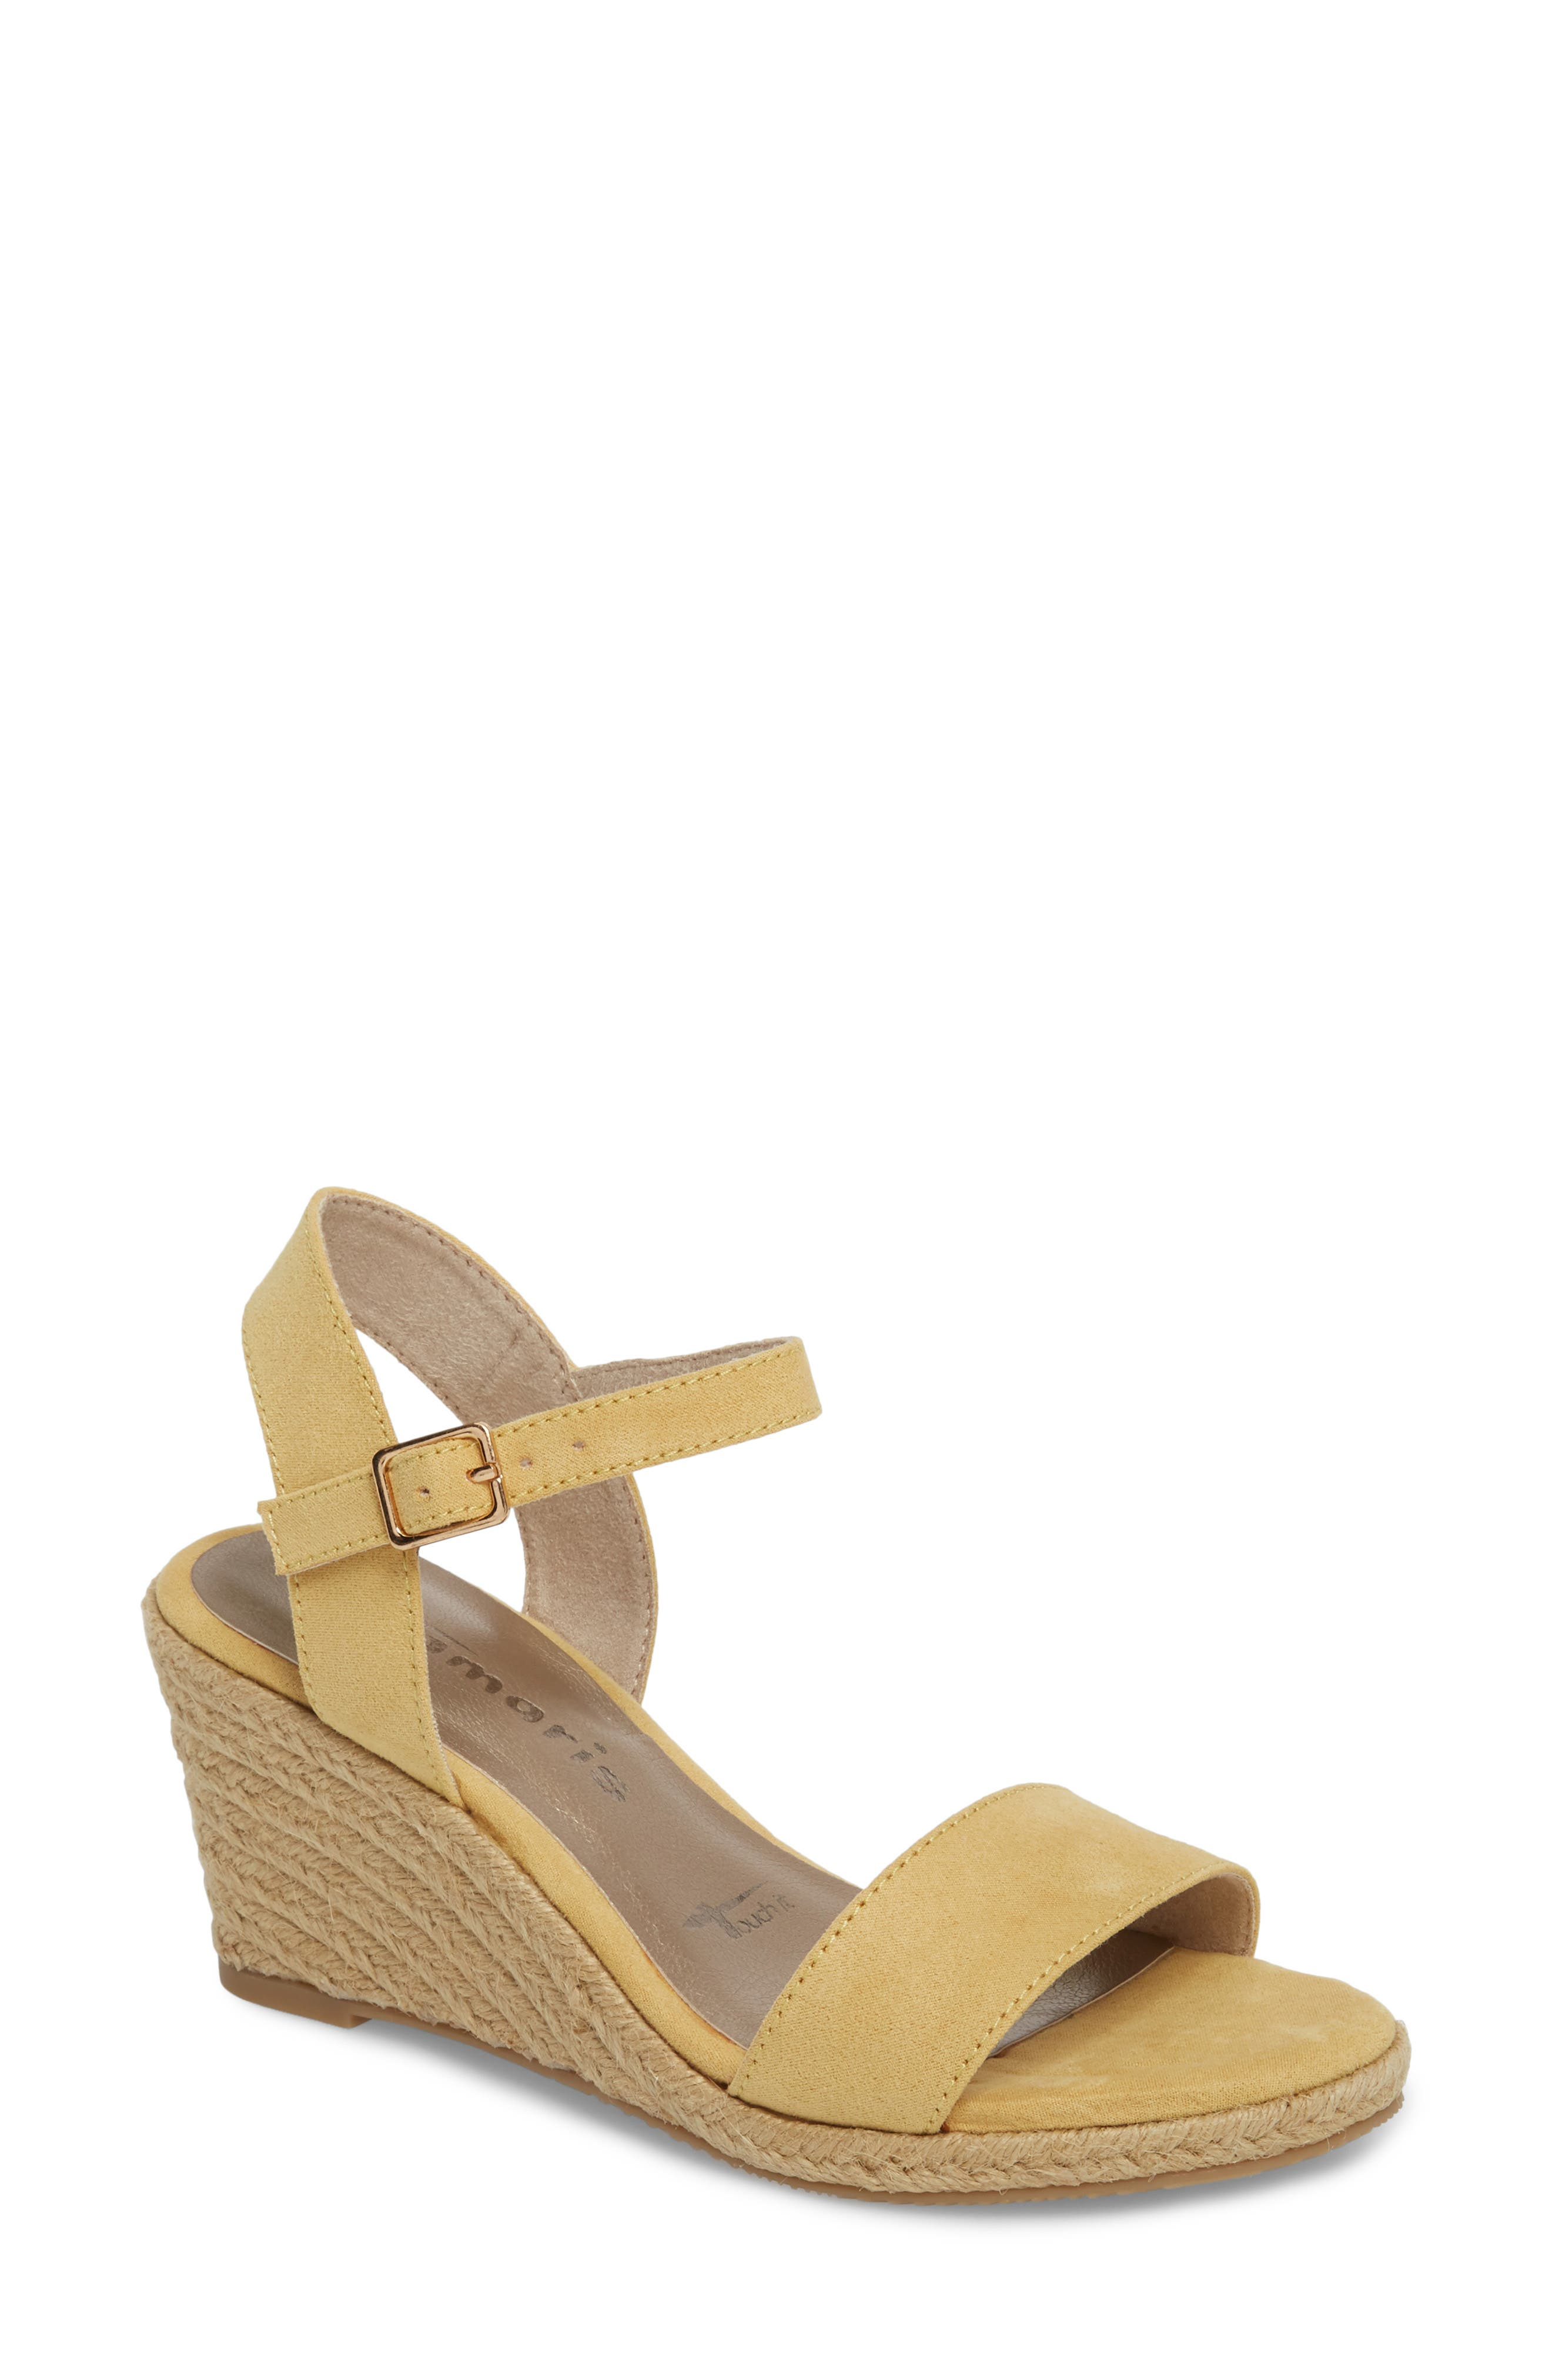 Livia Espadrille Wedge Sandal,                             Main thumbnail 1, color,                             Saffron Fabric